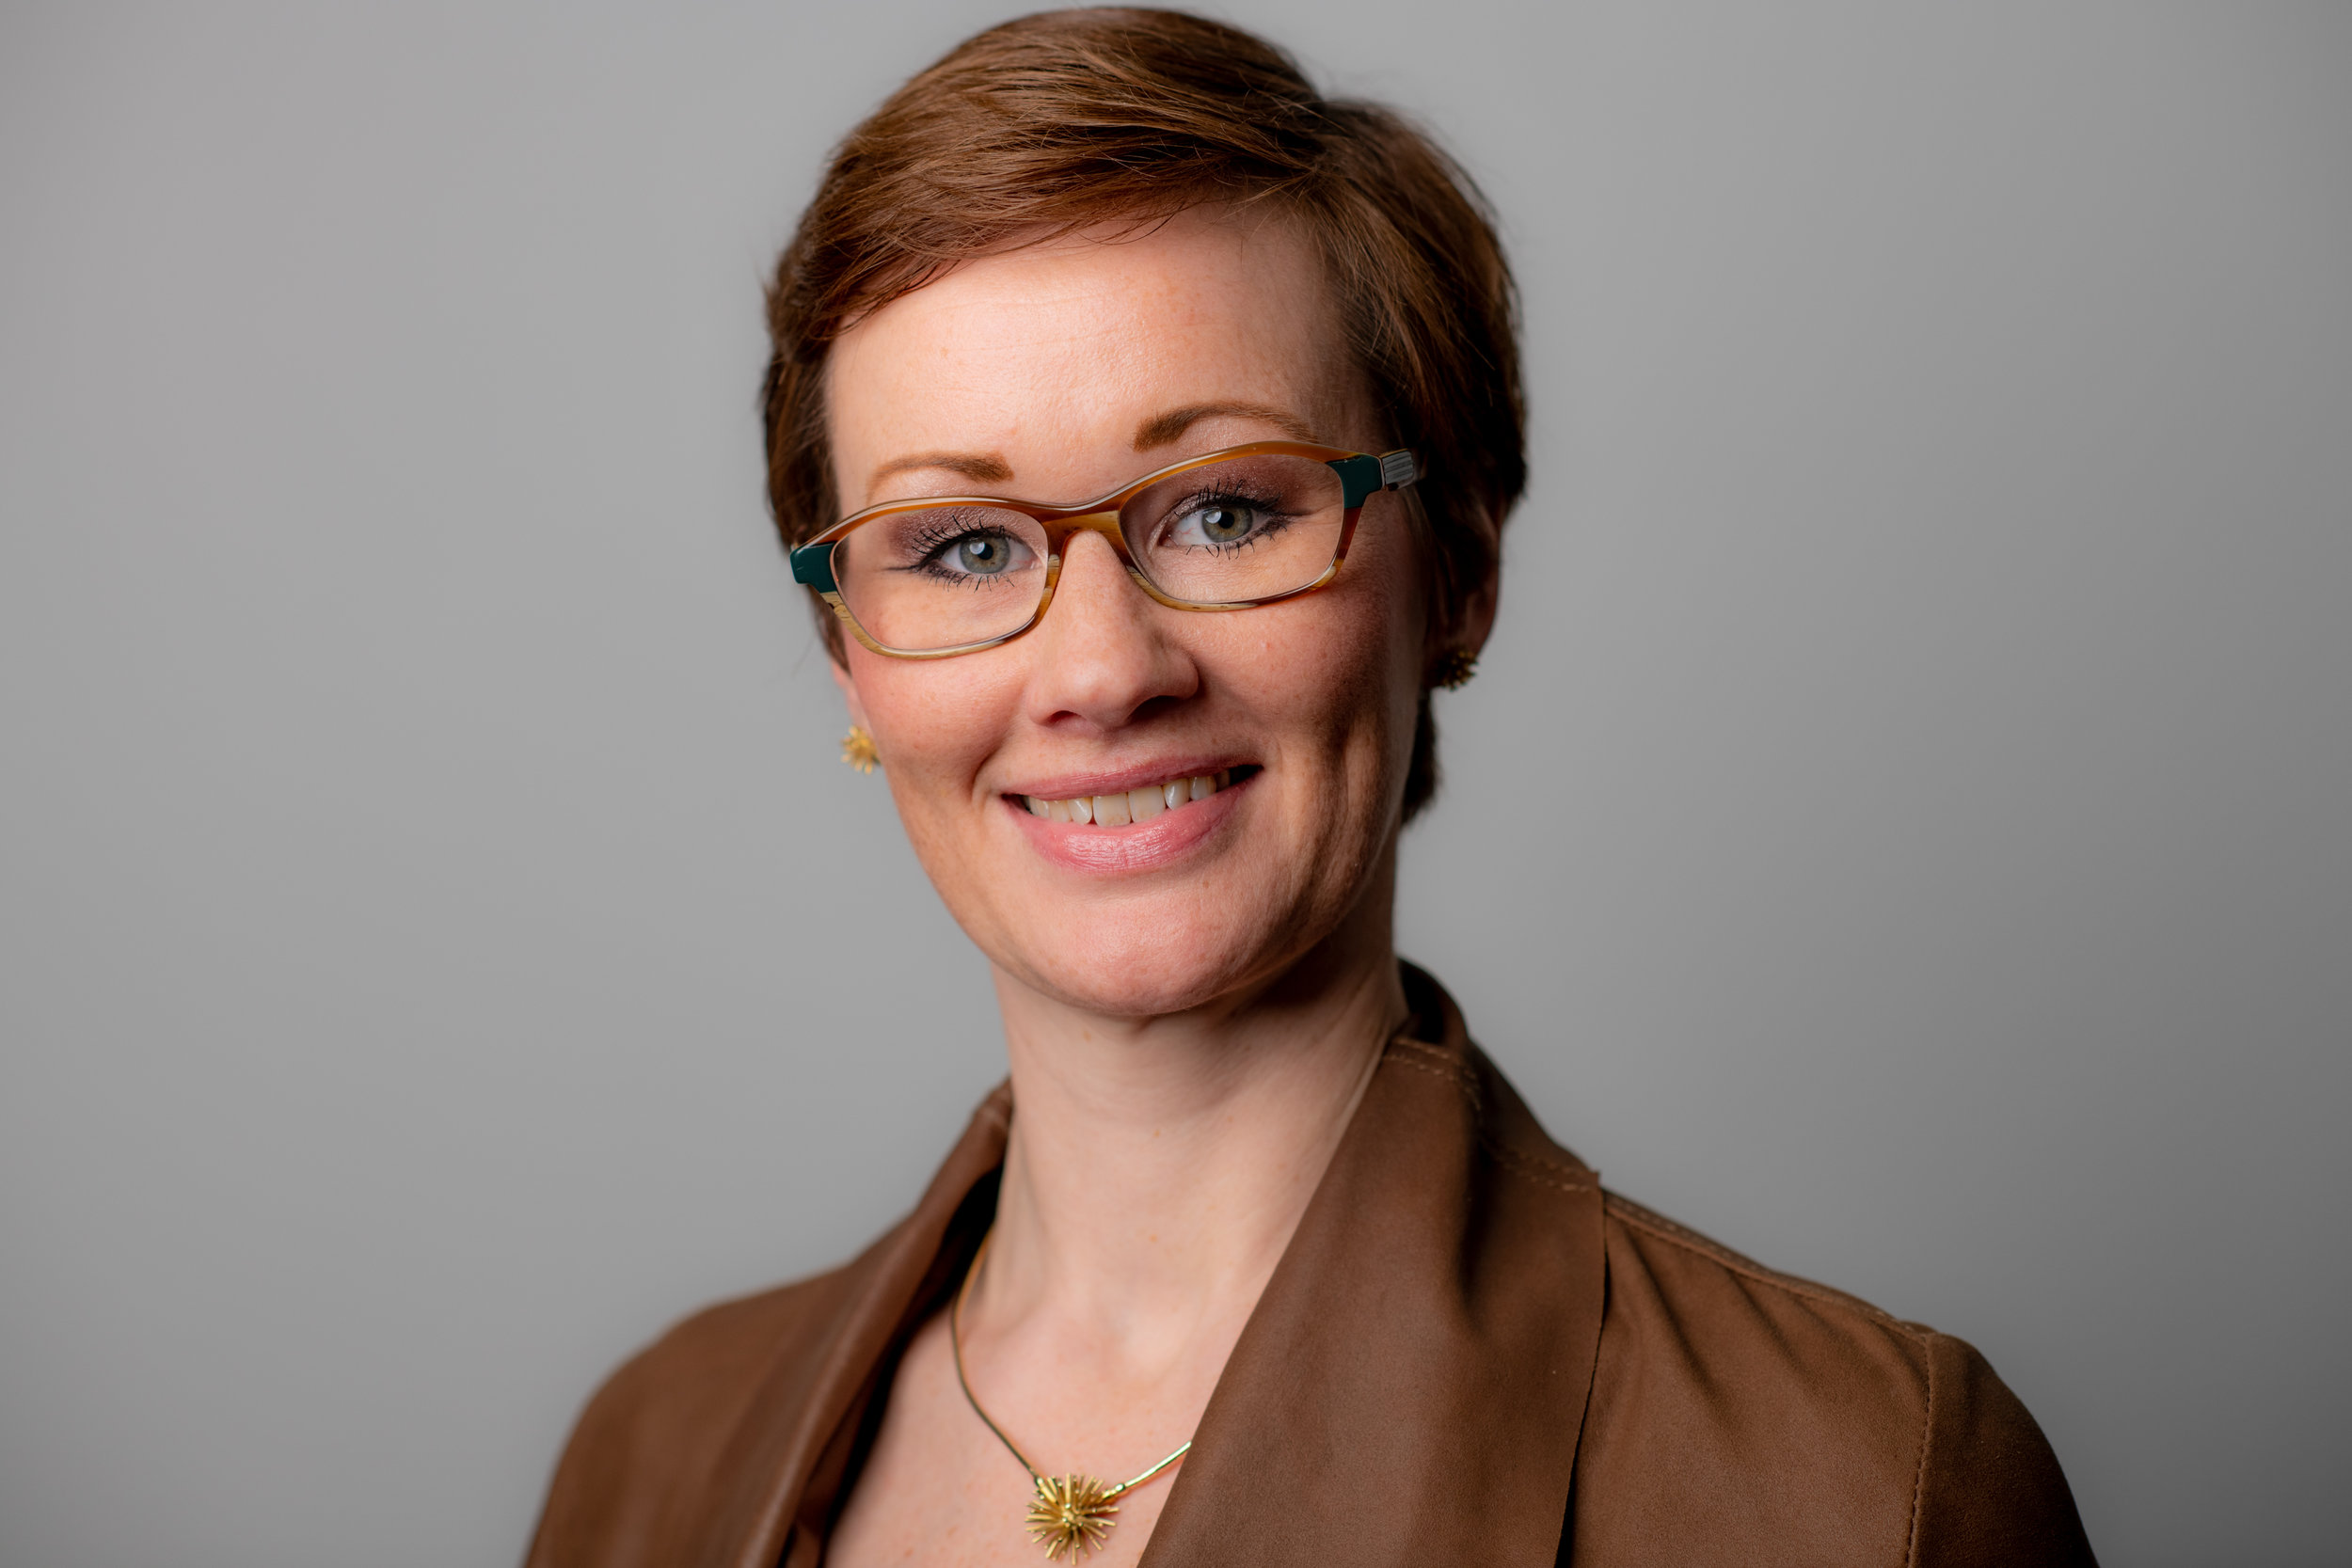 Medewerker Yvette Beumer Notarissen-7498.jpg